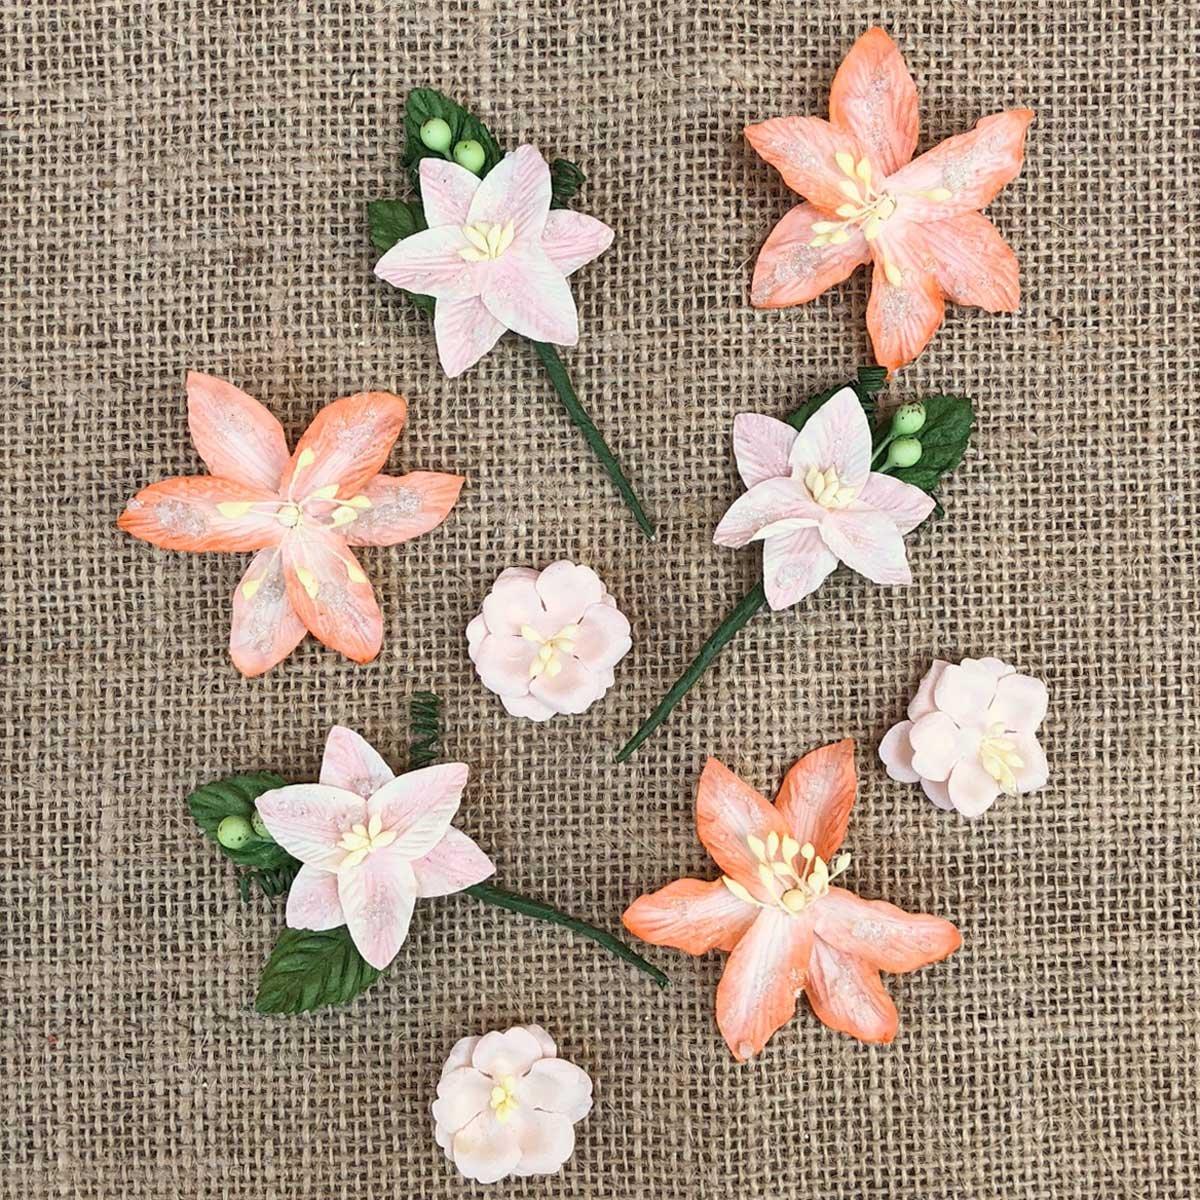 Stargazers Flowers - Peach Sorbet